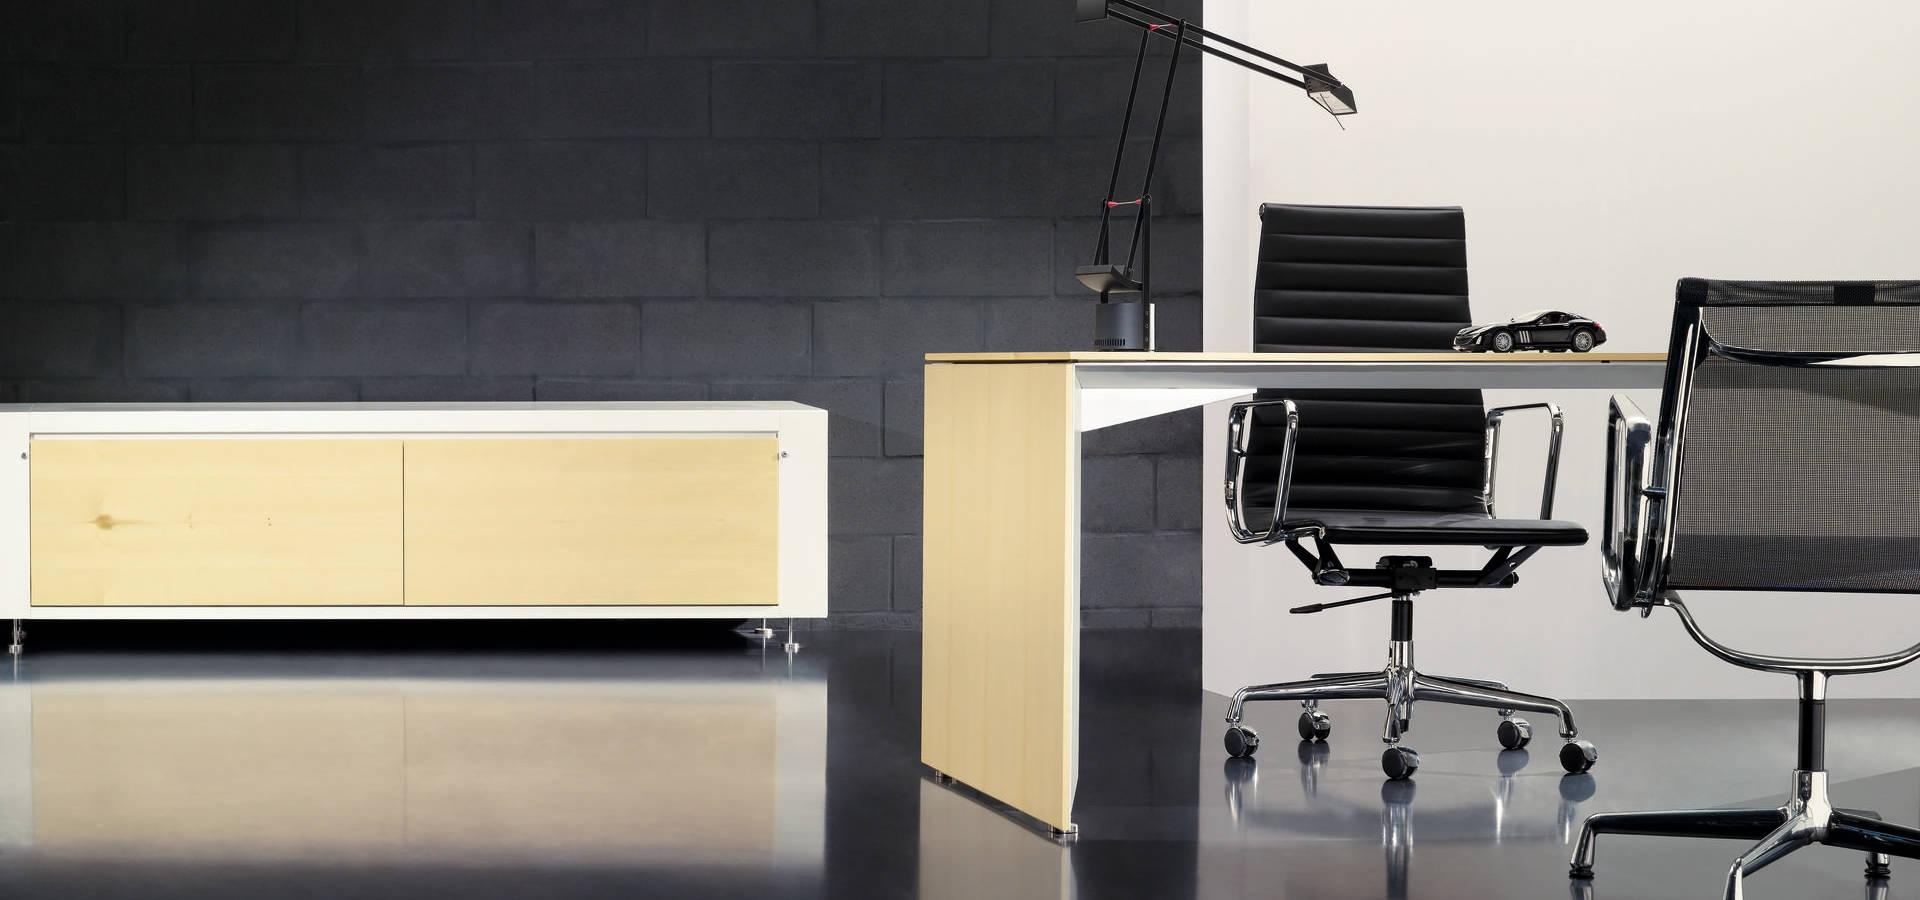 Mobili rio para escrit rio por mobili rio de escrit rio for Mobiliario de escritorio